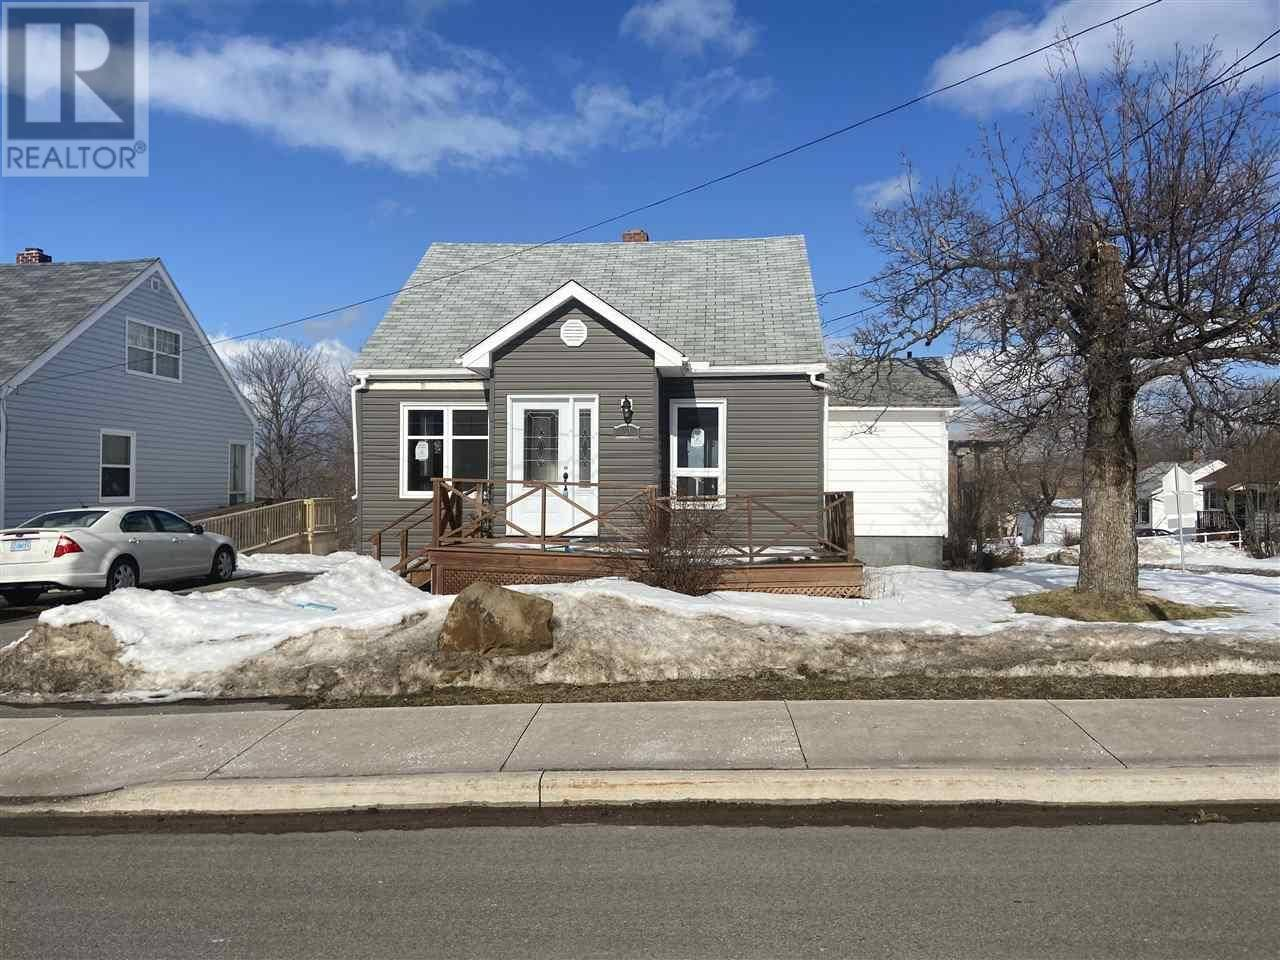 House for sale at 53 Grandview Ave Trenton Nova Scotia - MLS: 202004126